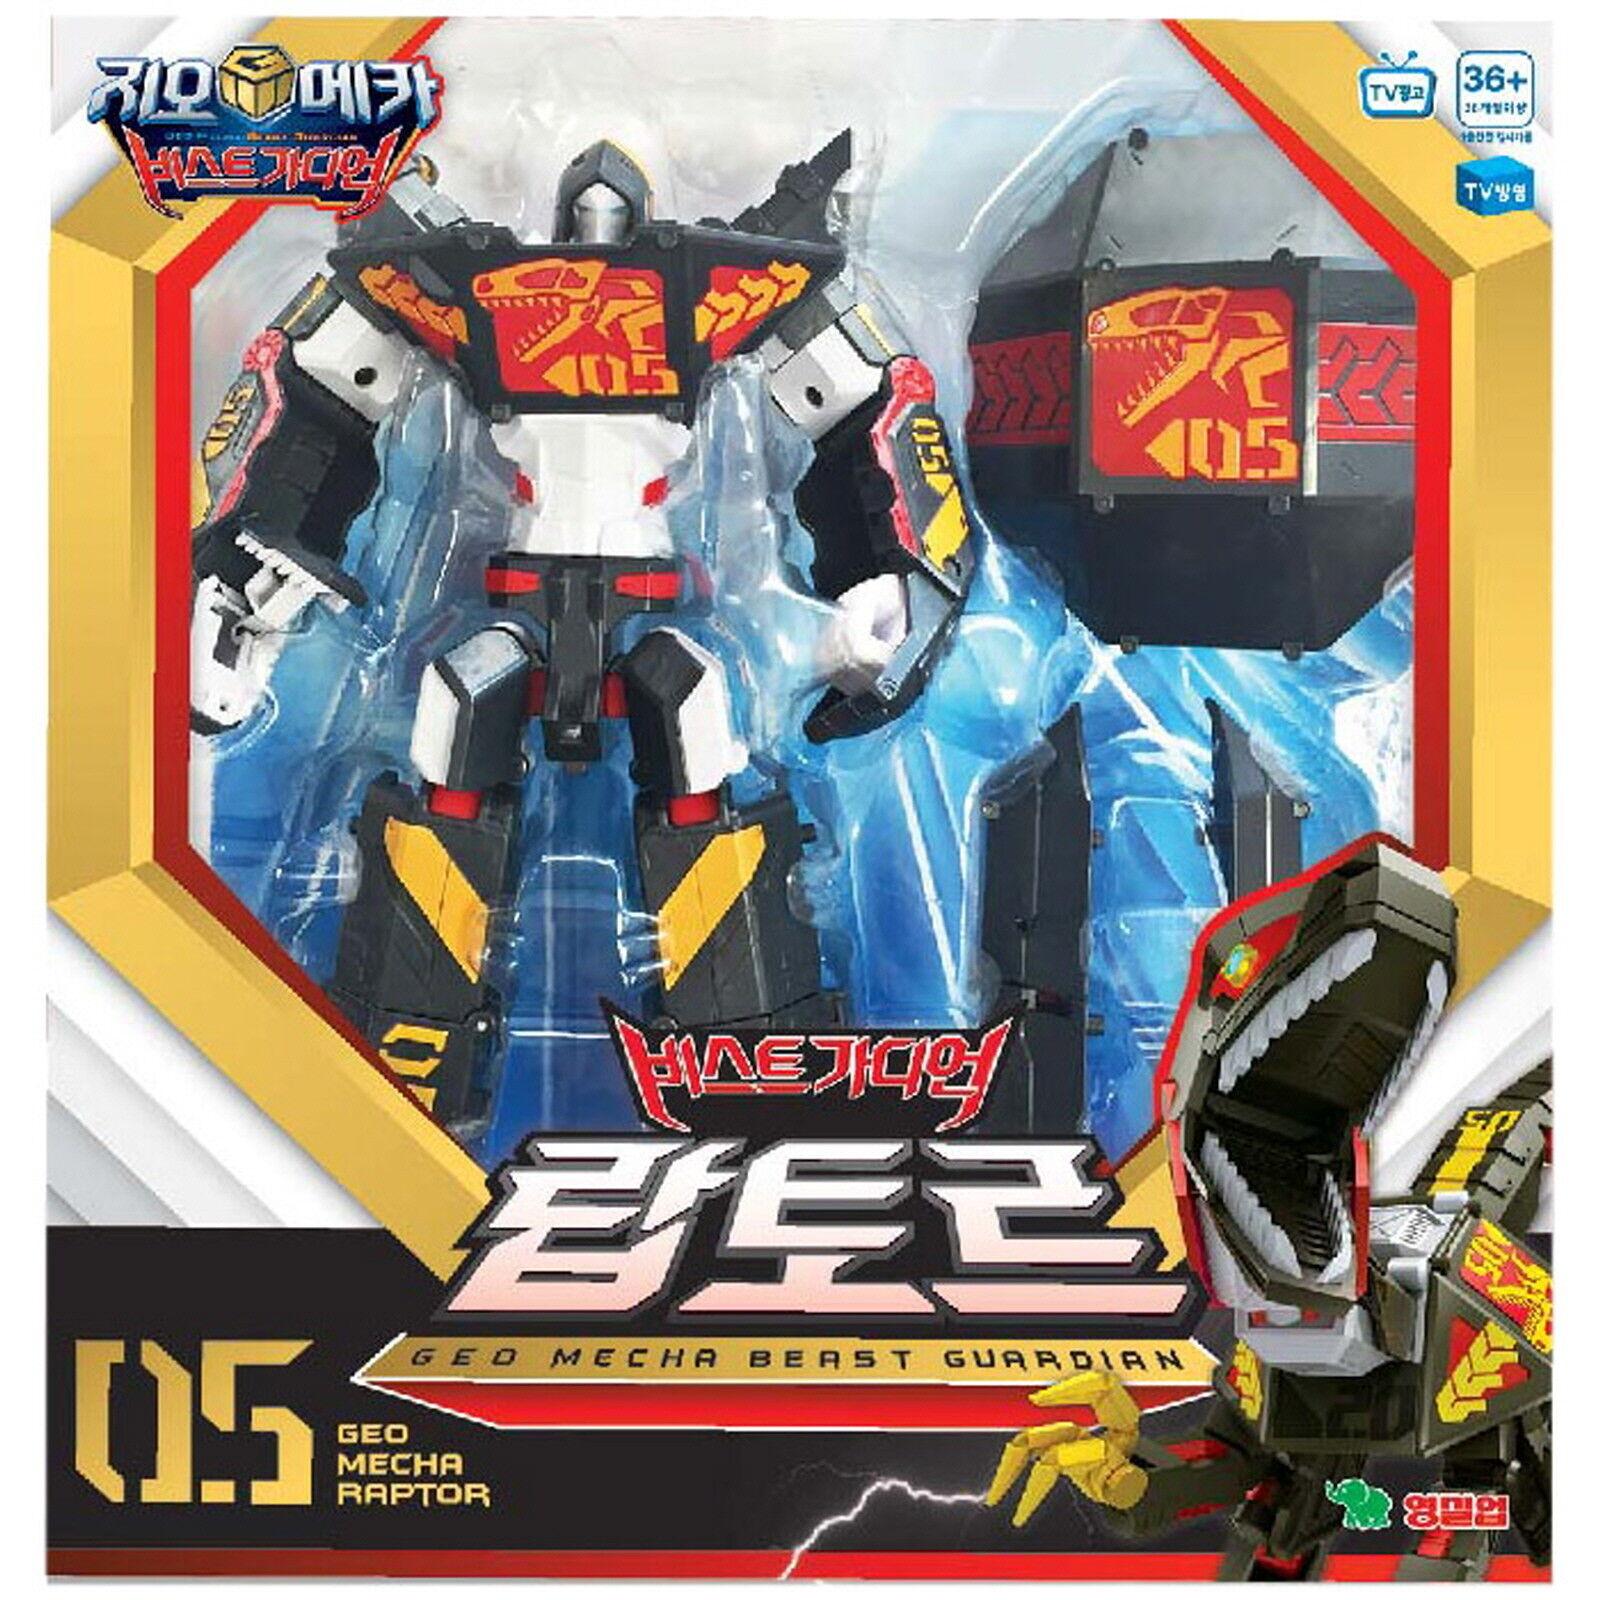 Geo Mecha Beast Guardian RAPTOR Transformer Robot Dinosaurs Toy Action Figure